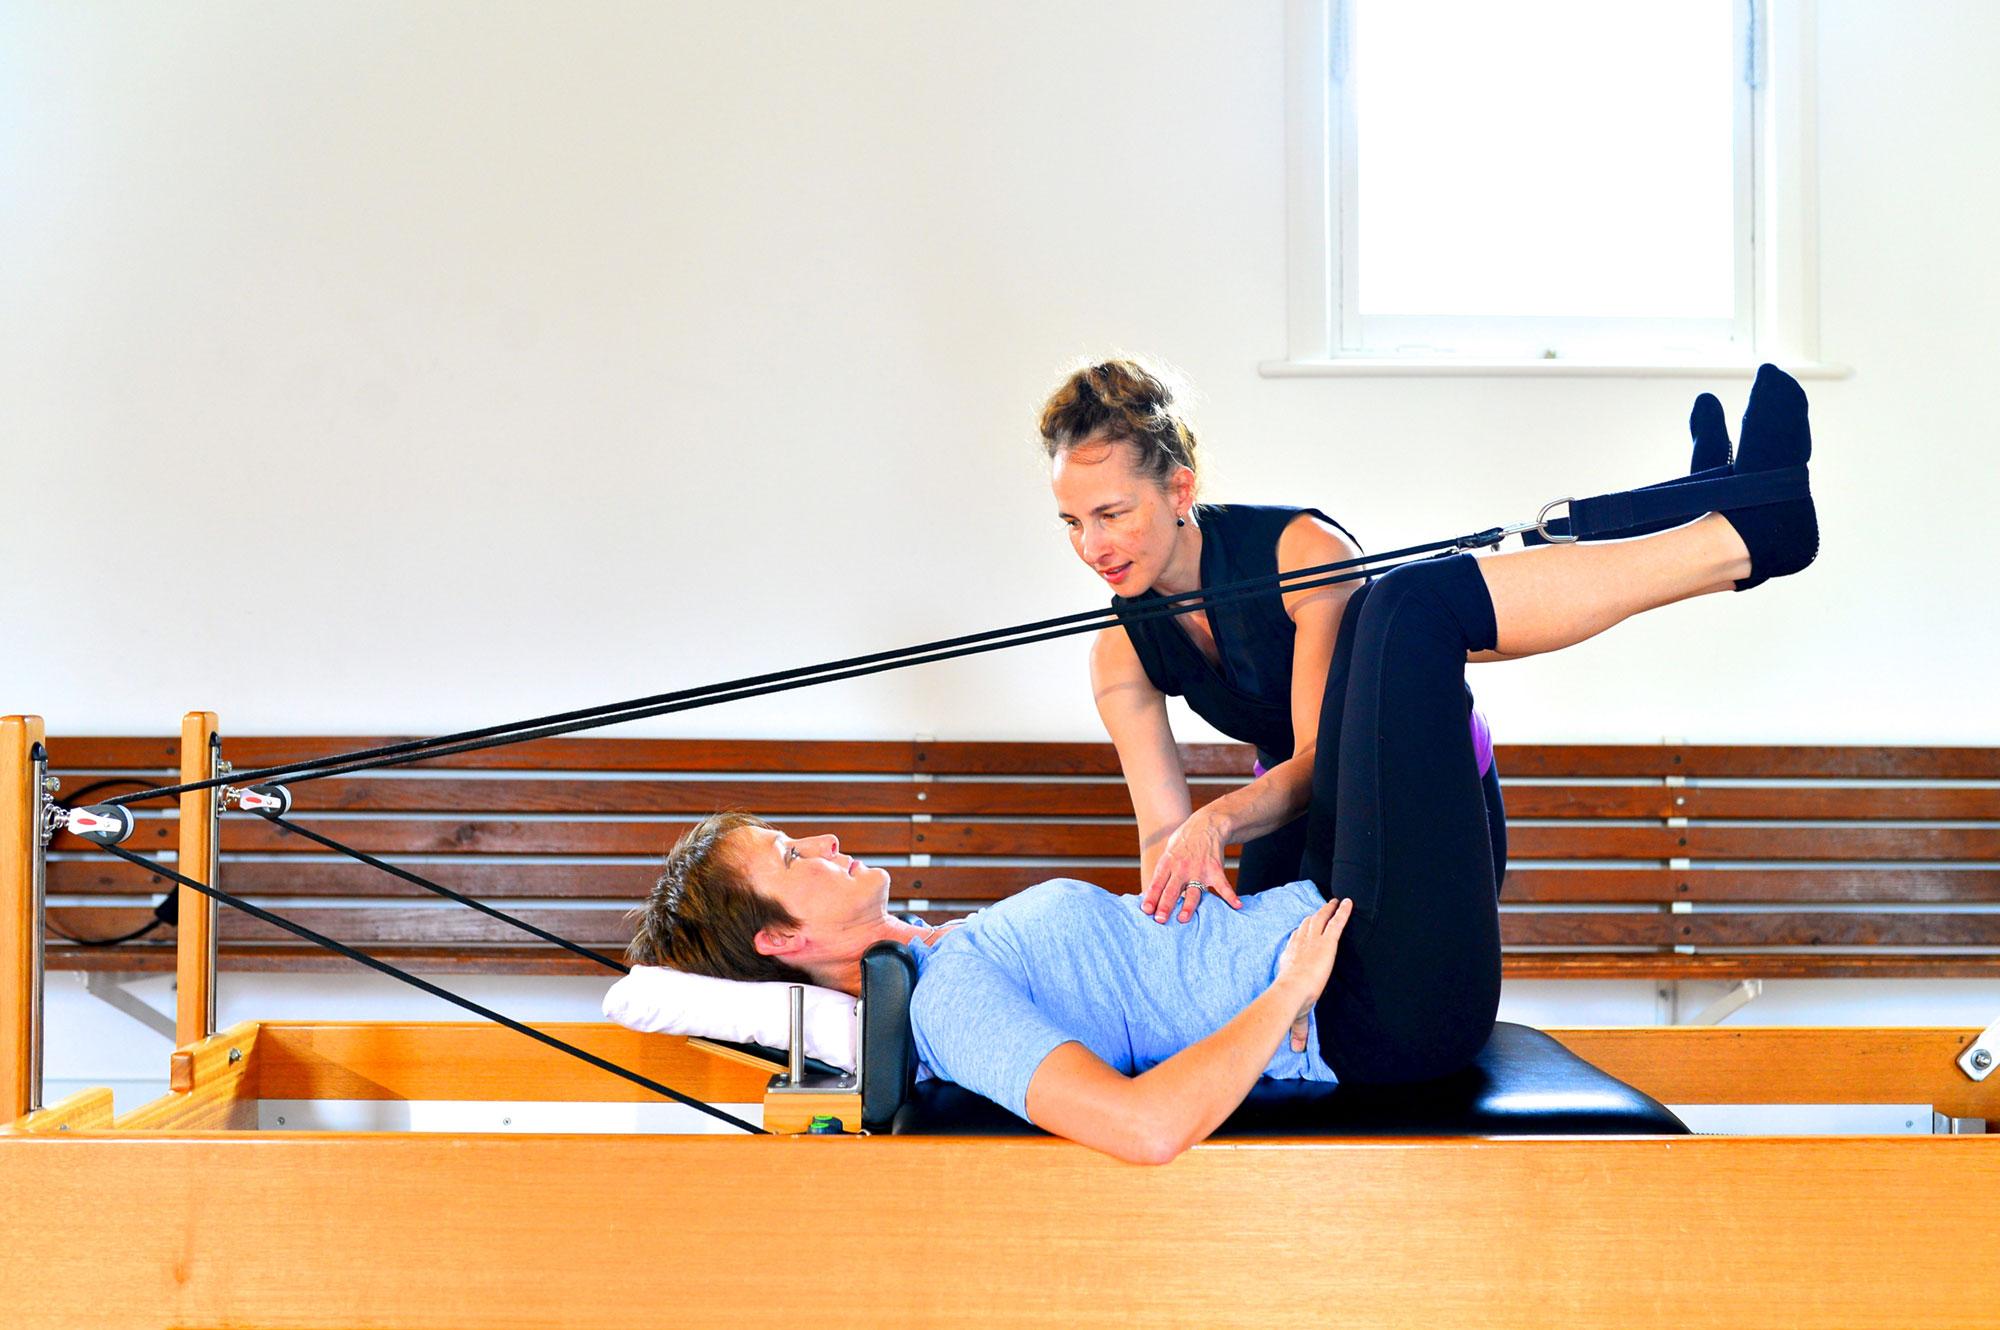 Queen Street Pilates Studio Adelaide Pilates Instructor Training